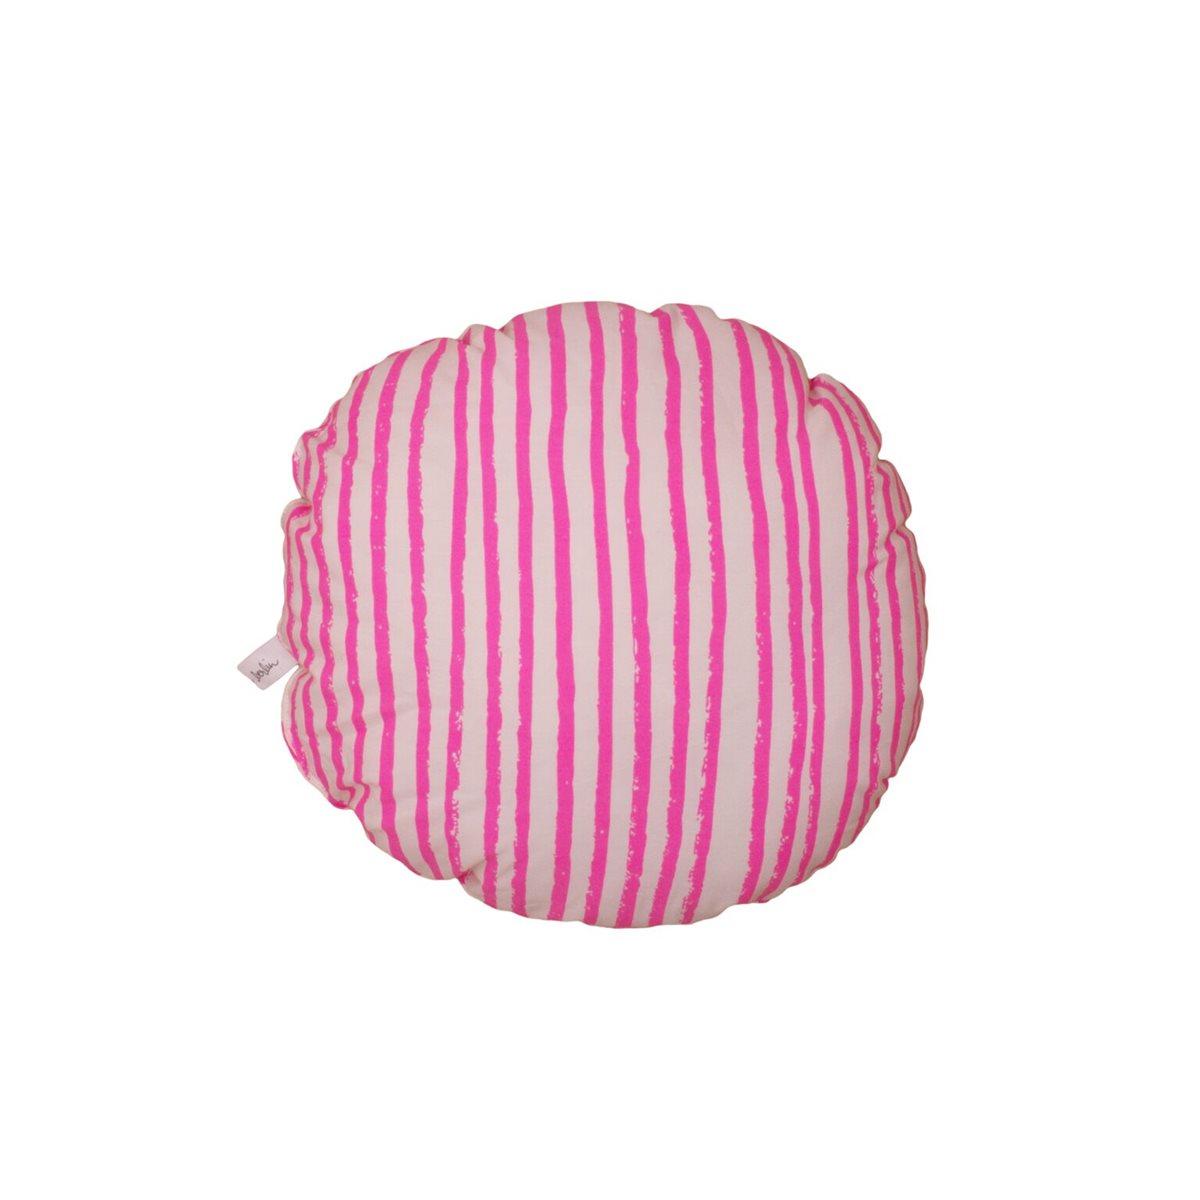 Monkeymccoy Noe Amp Zoe Circle Pillow Neon Pink Stripes